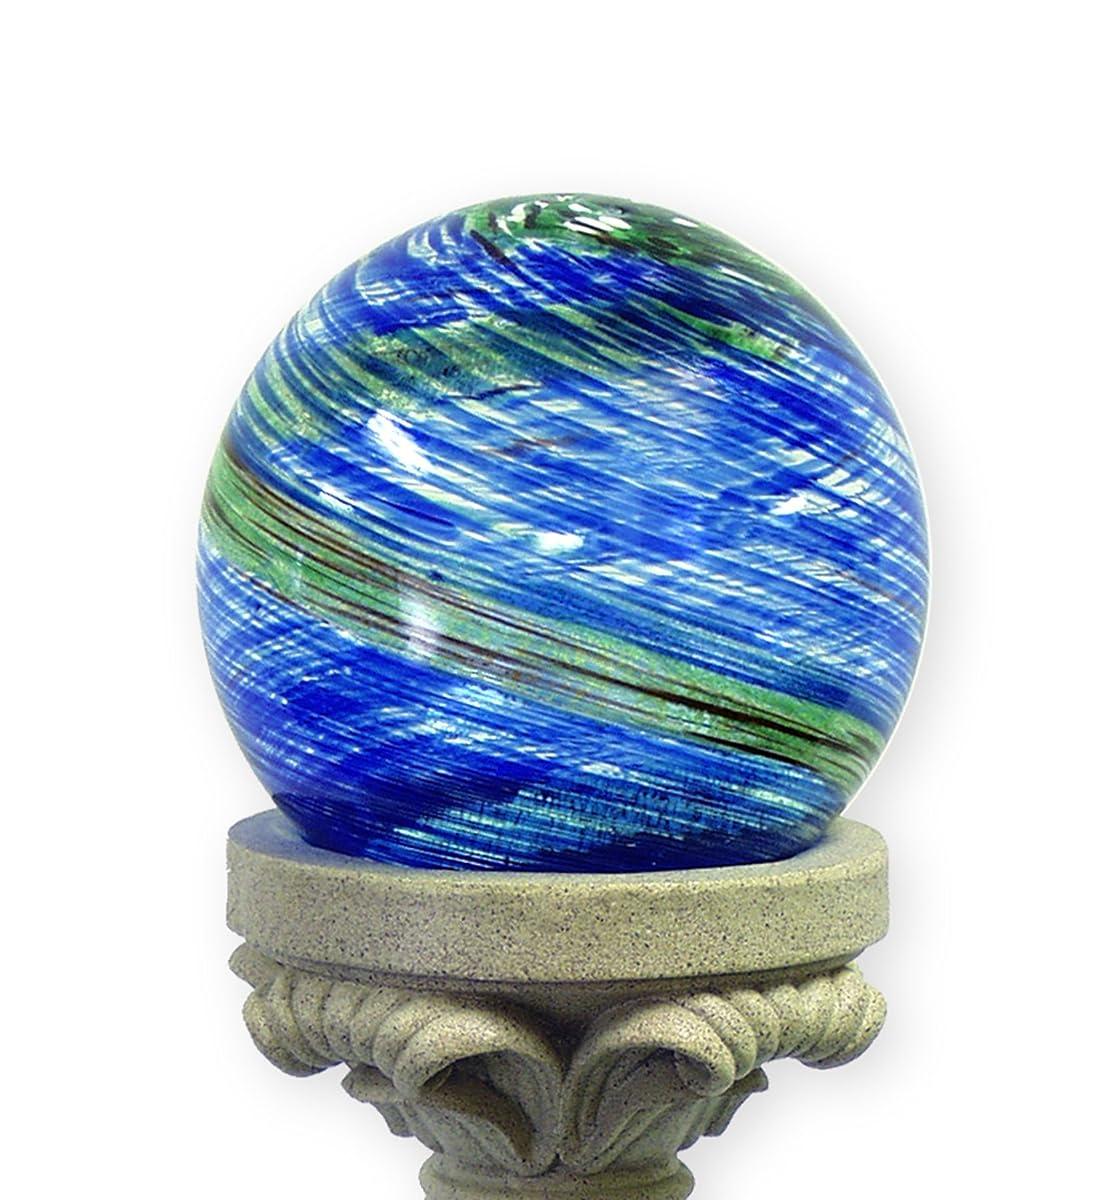 Echo Valley 8140 10-Inch Glow-in-the-Dark Illuminarie Glass Gazing Globe, Light Blue Swirl